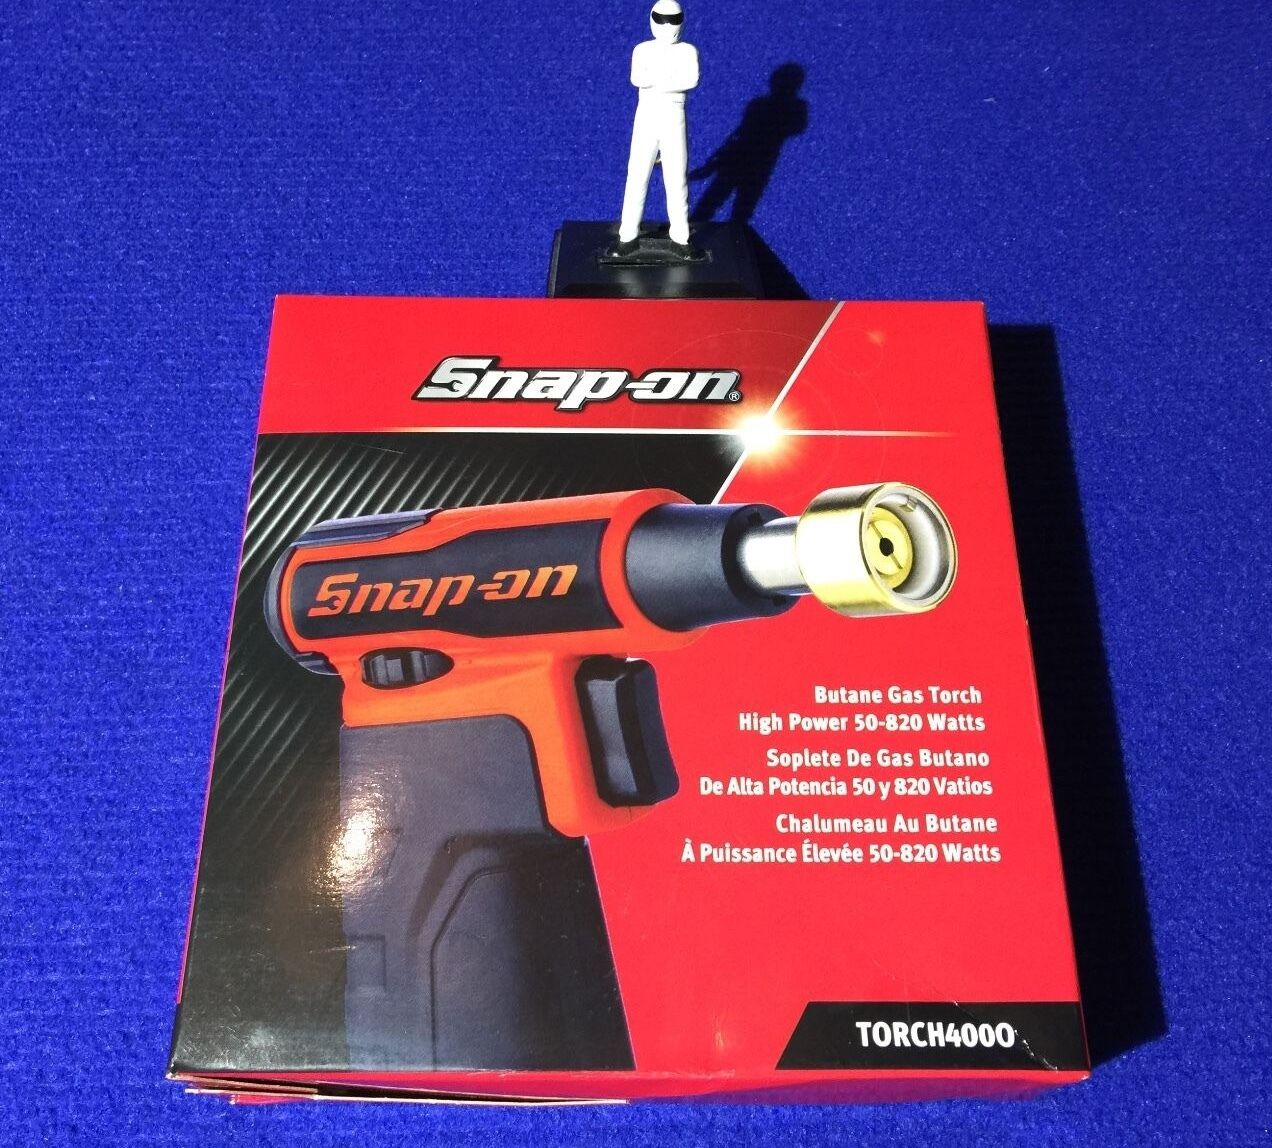 Snap On Cordless High Power Butane Gas Blow Torch 50/820 watts TORCH400O Orange